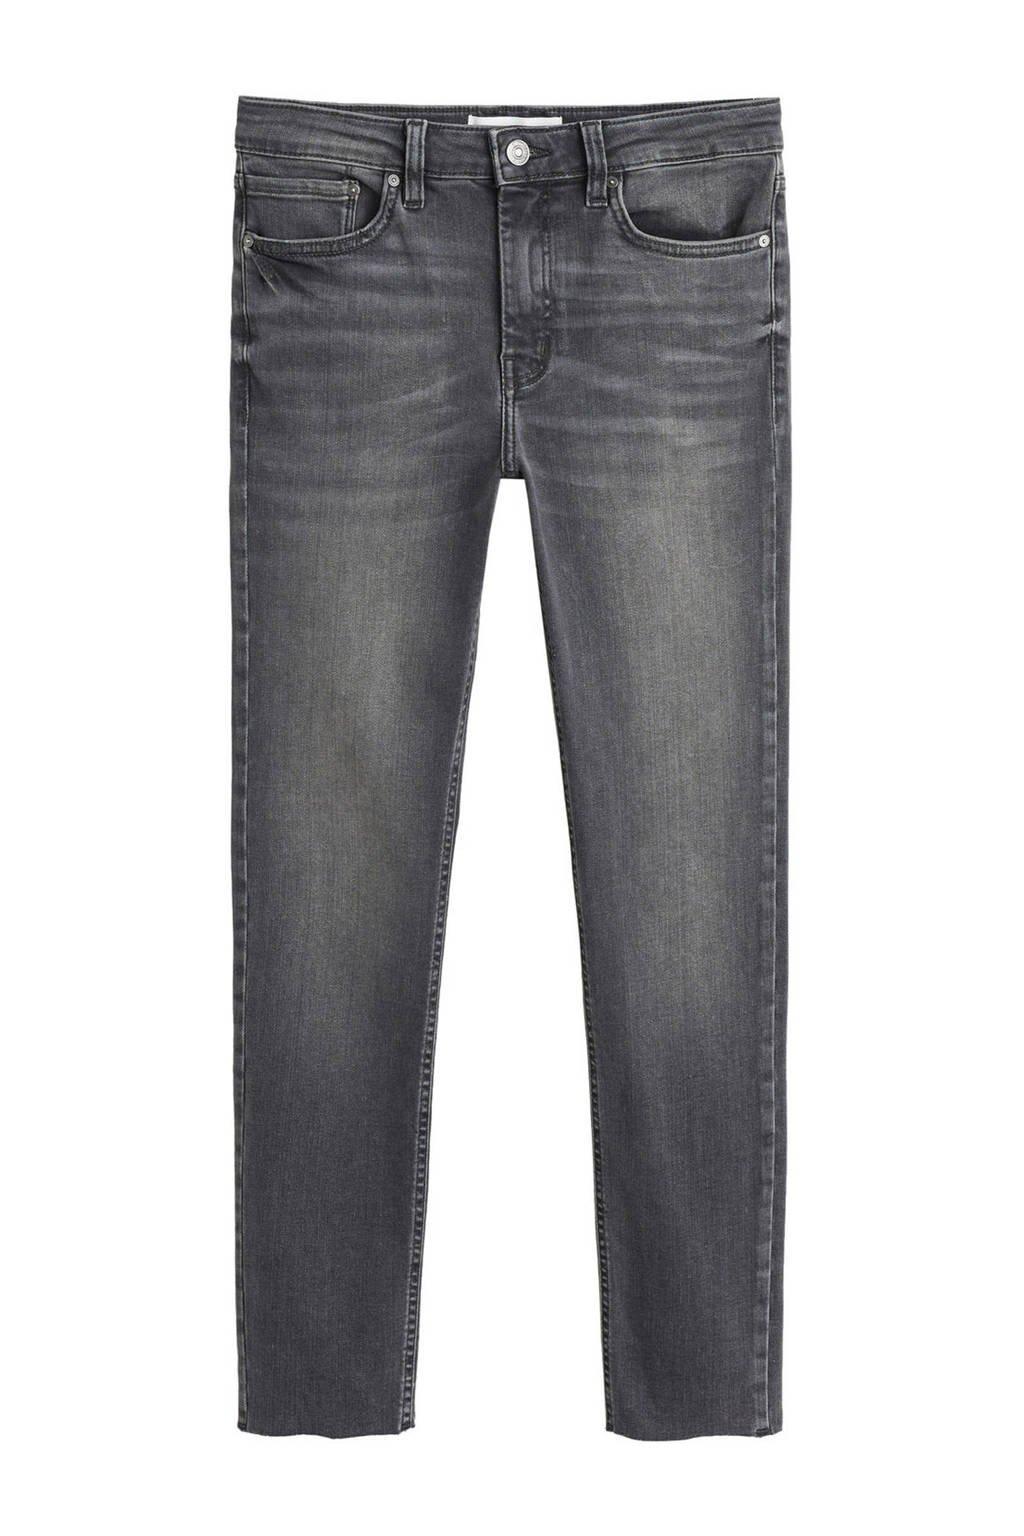 Mango skinny jeans grijs, Grijs